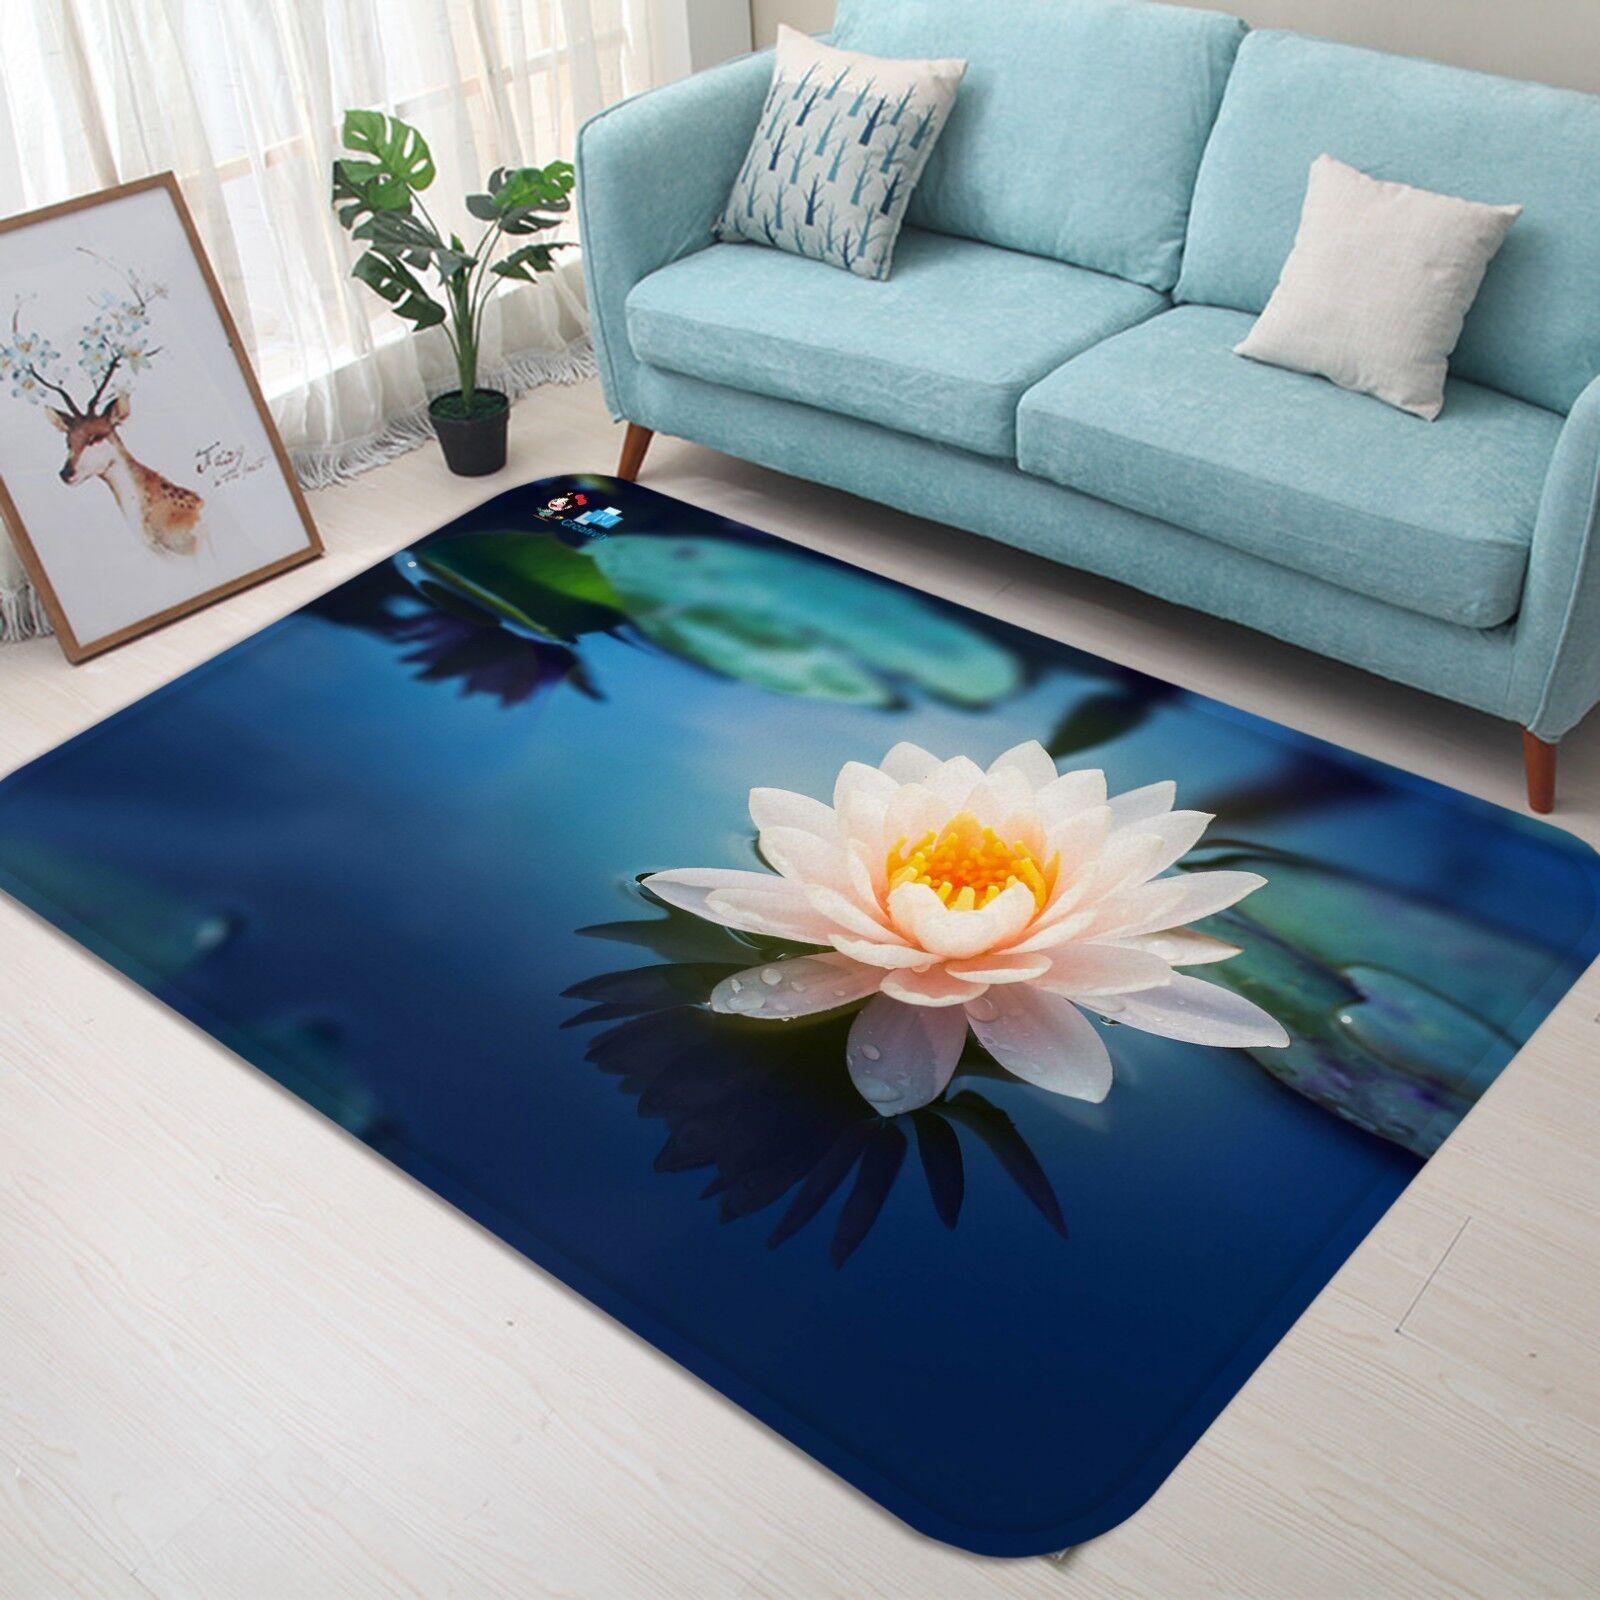 3D Pool Rosa Lotus 672 Non Slip Slip Slip Rug Mat Room Mat Quality Elegant Photo Carpet US 00fa7f